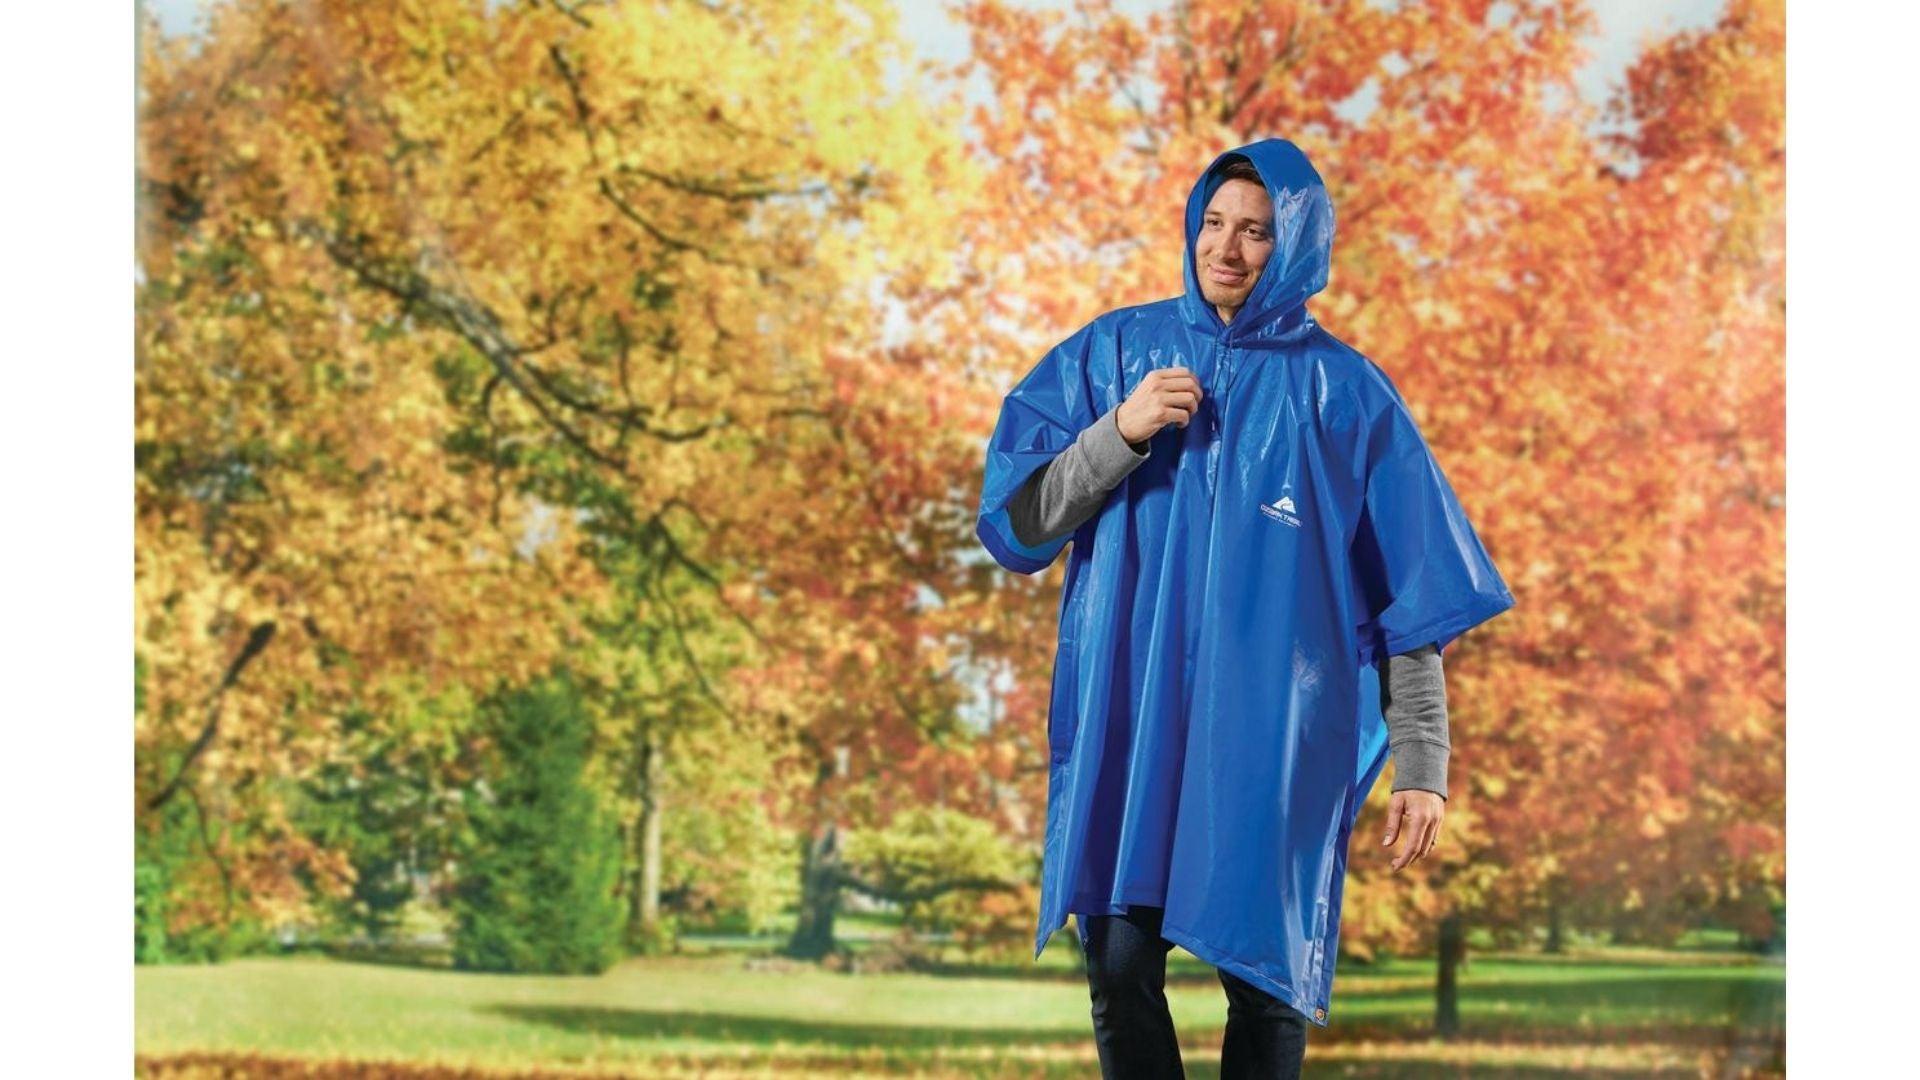 Ozark Trail Eva Adult Rainwear Poncho, Blue, One Size Fits Most